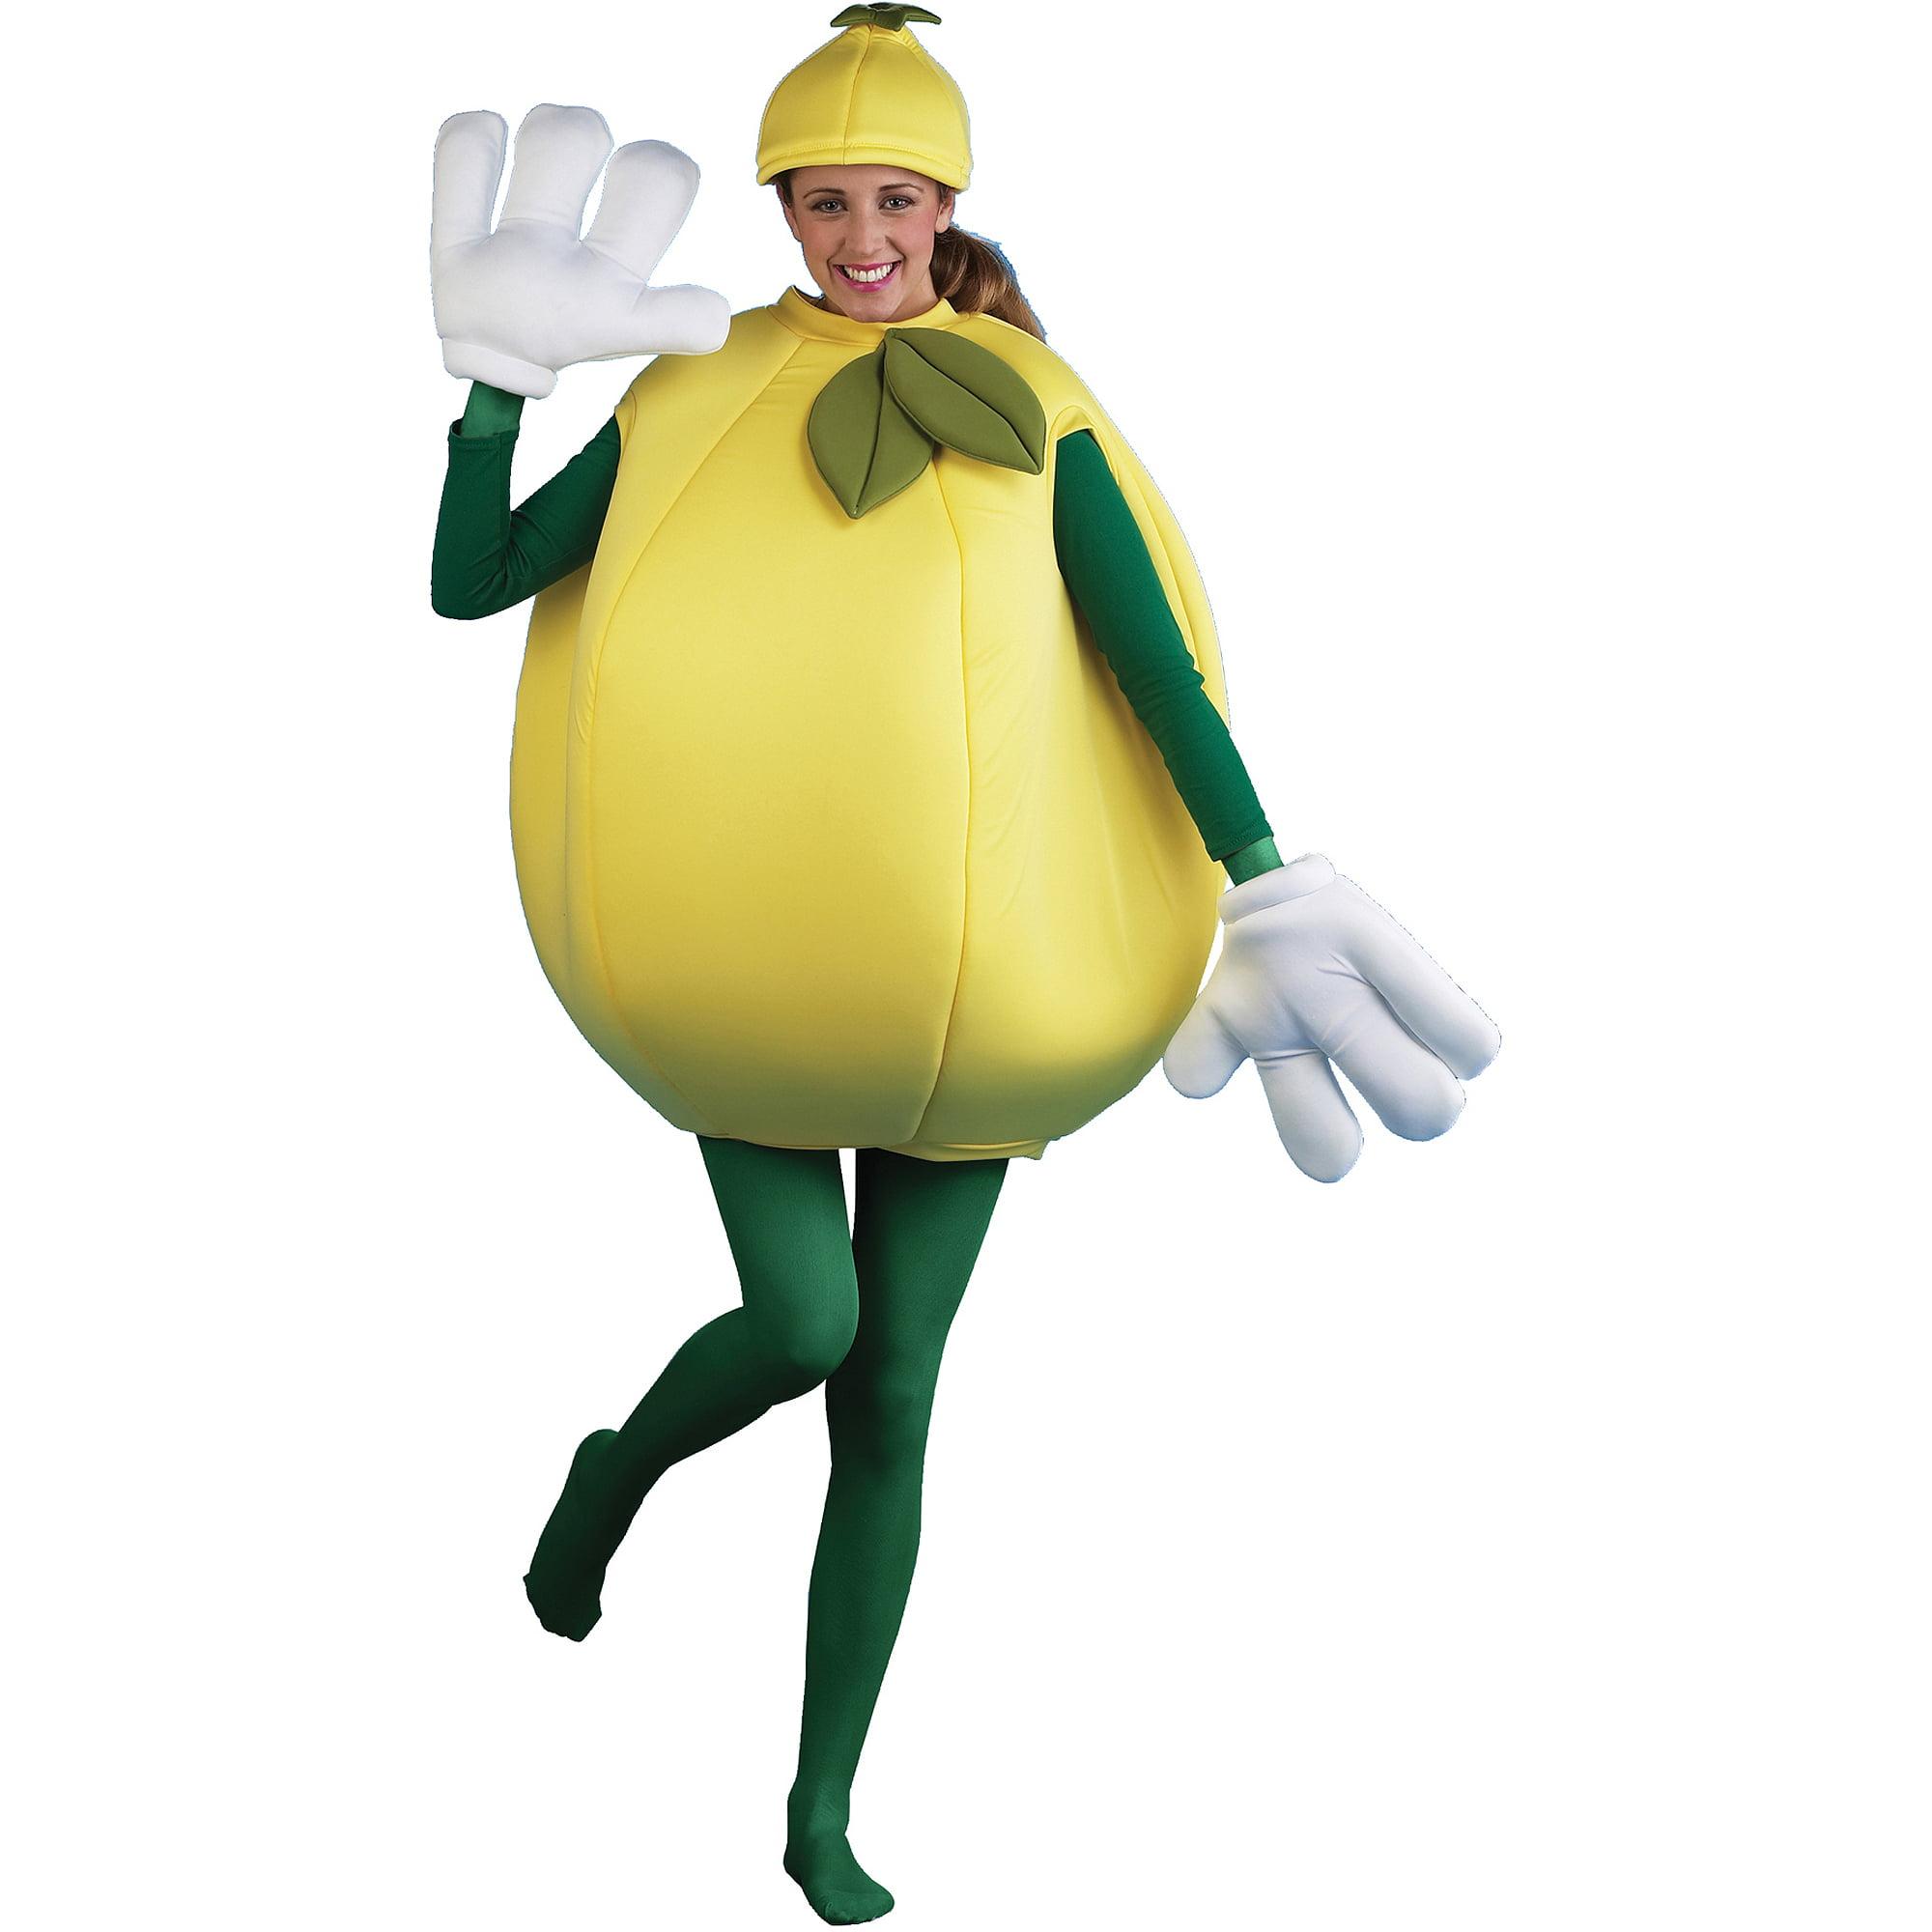 sc 1 st  Walmart & Lemon Adult Halloween Costume - Walmart.com